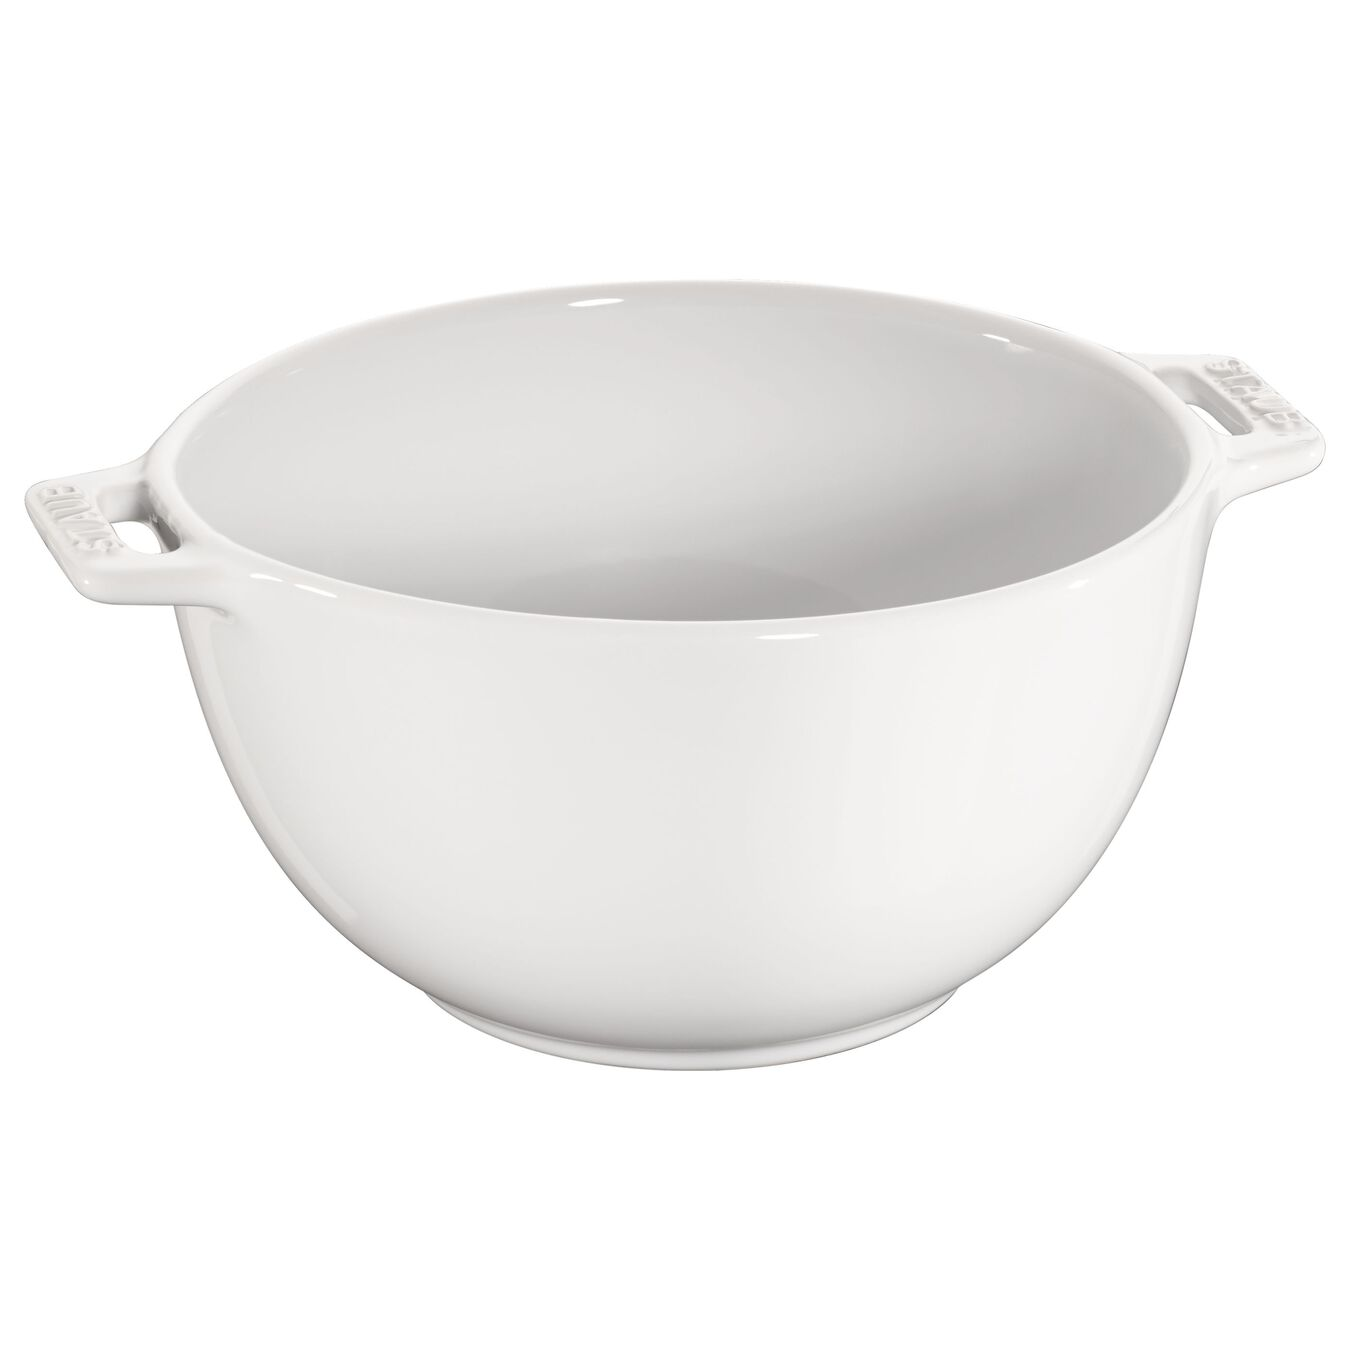 Bowl 18 cm, Cerâmica, Branco puro,,large 1